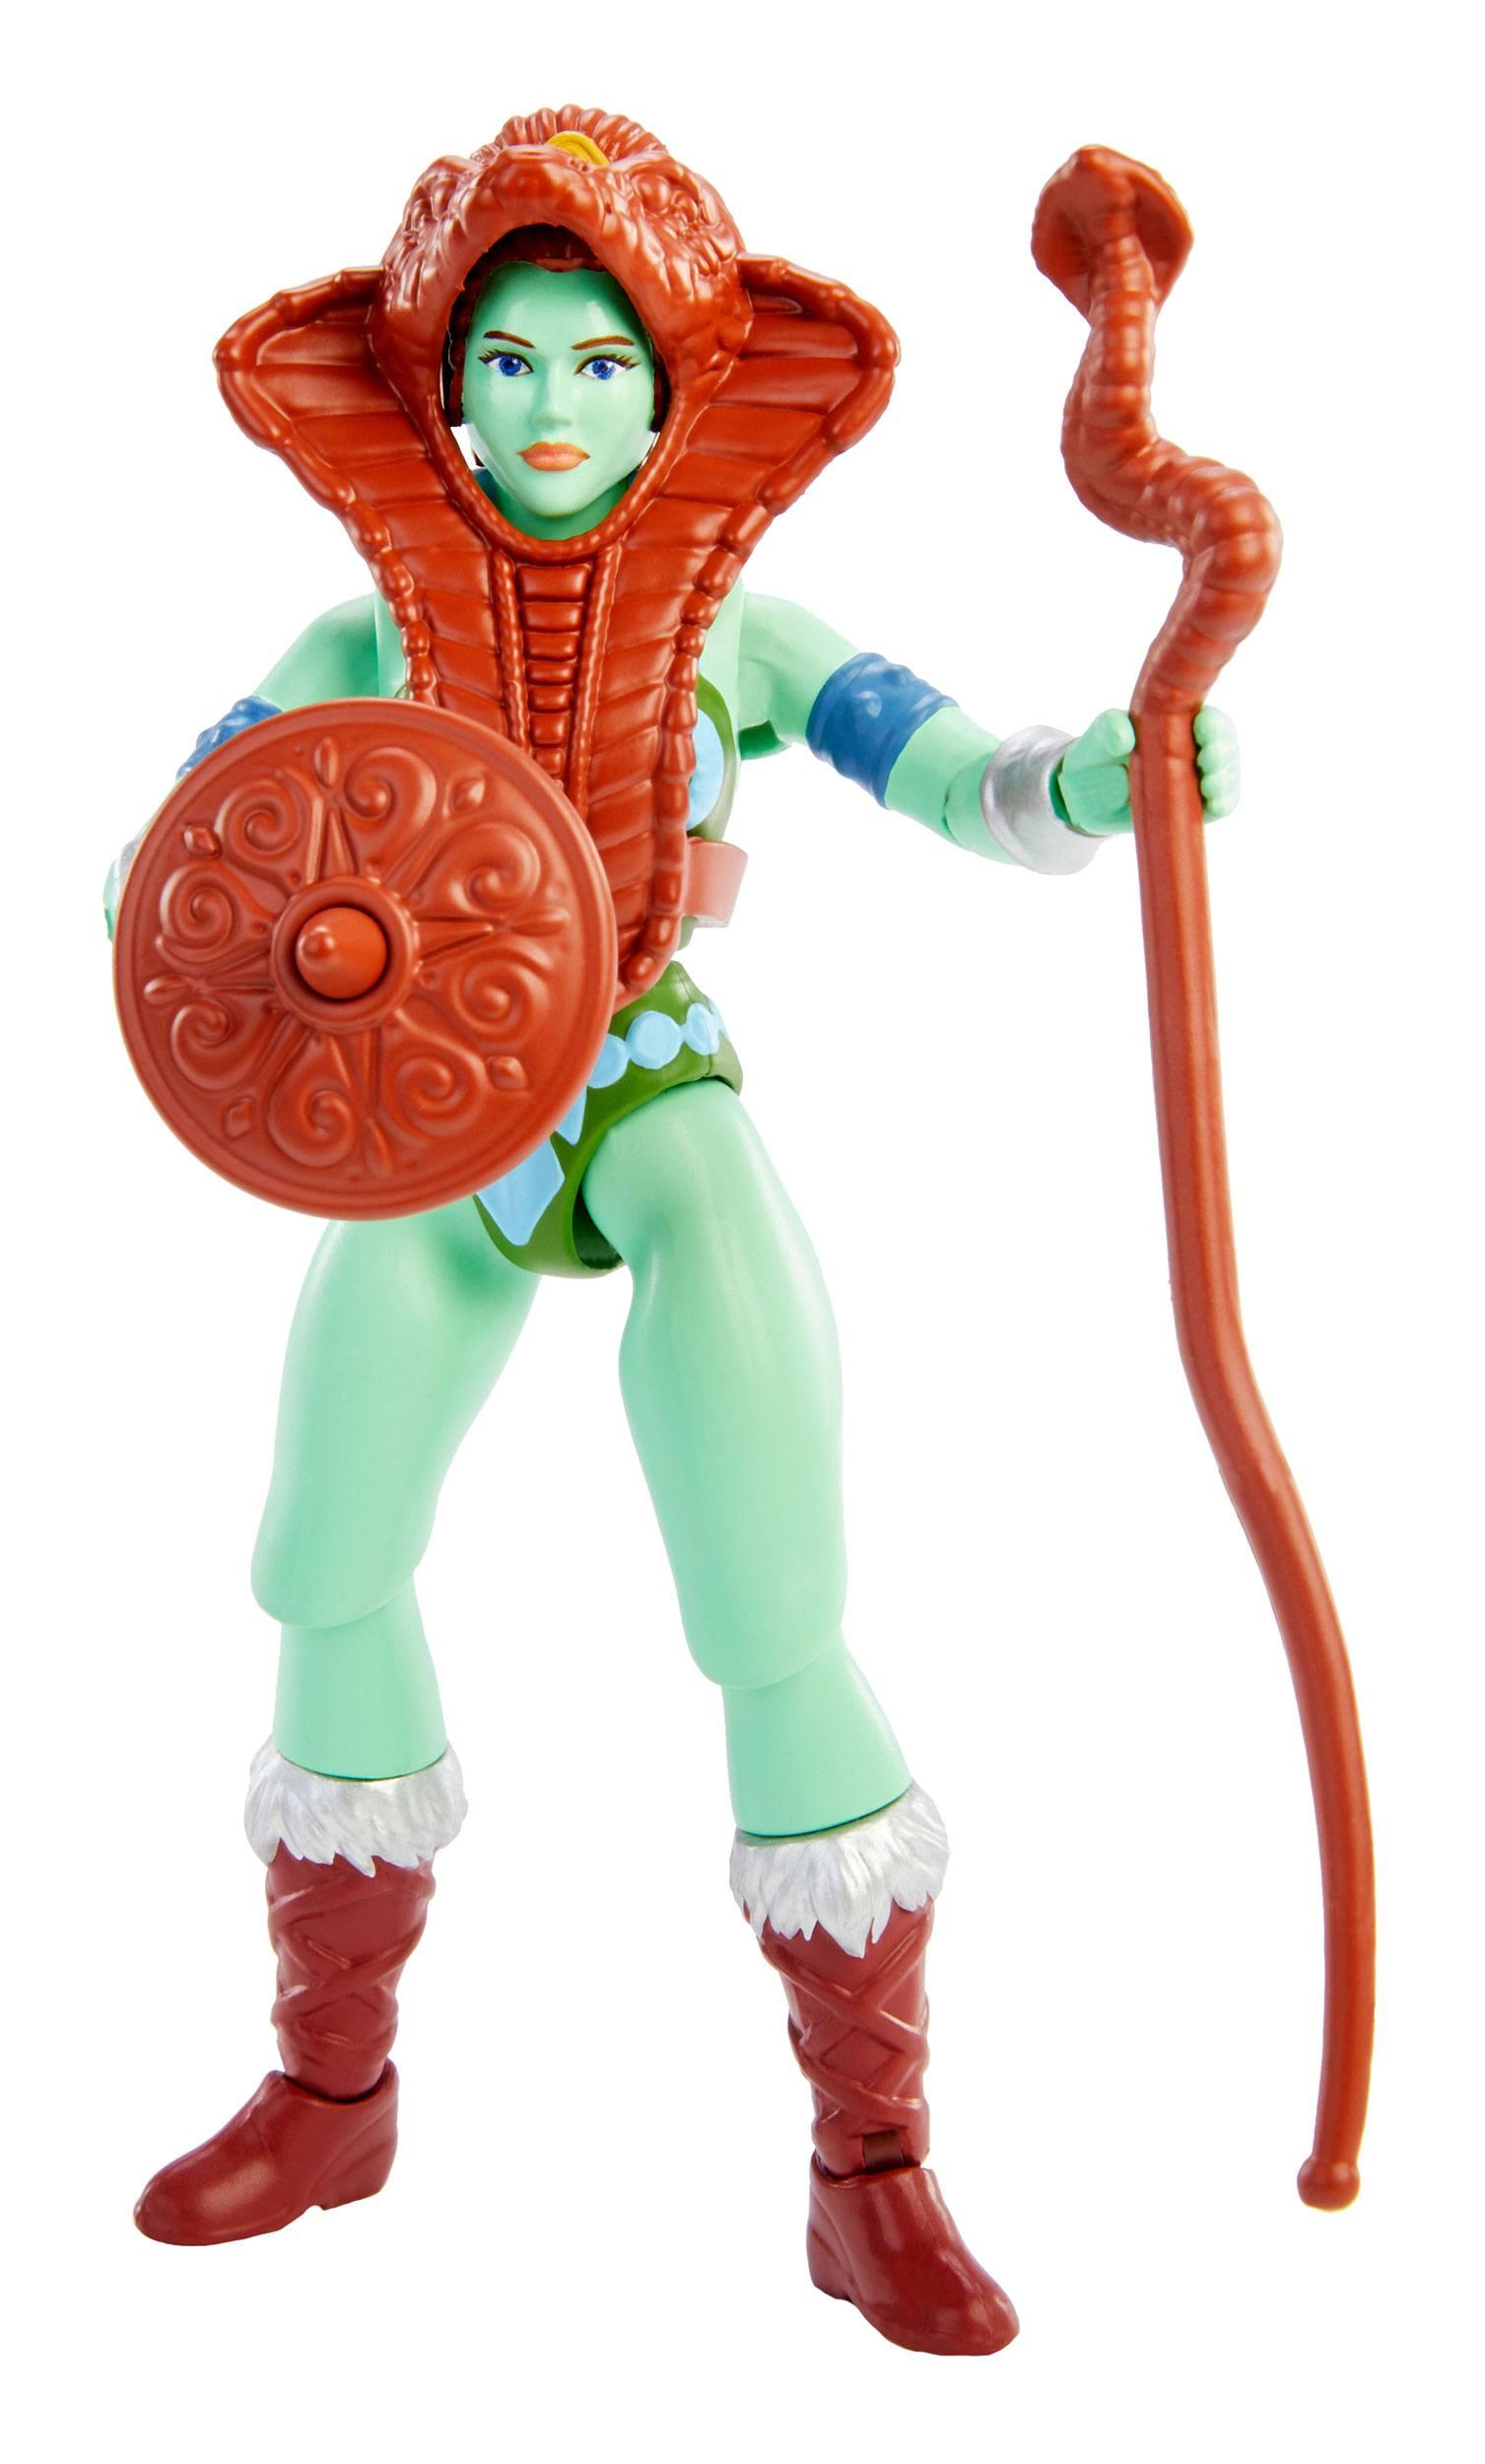 Masters of the Universe Origins Actionfigur 2021 Green Goddess 14 cm MATTGYY27 0887961982855